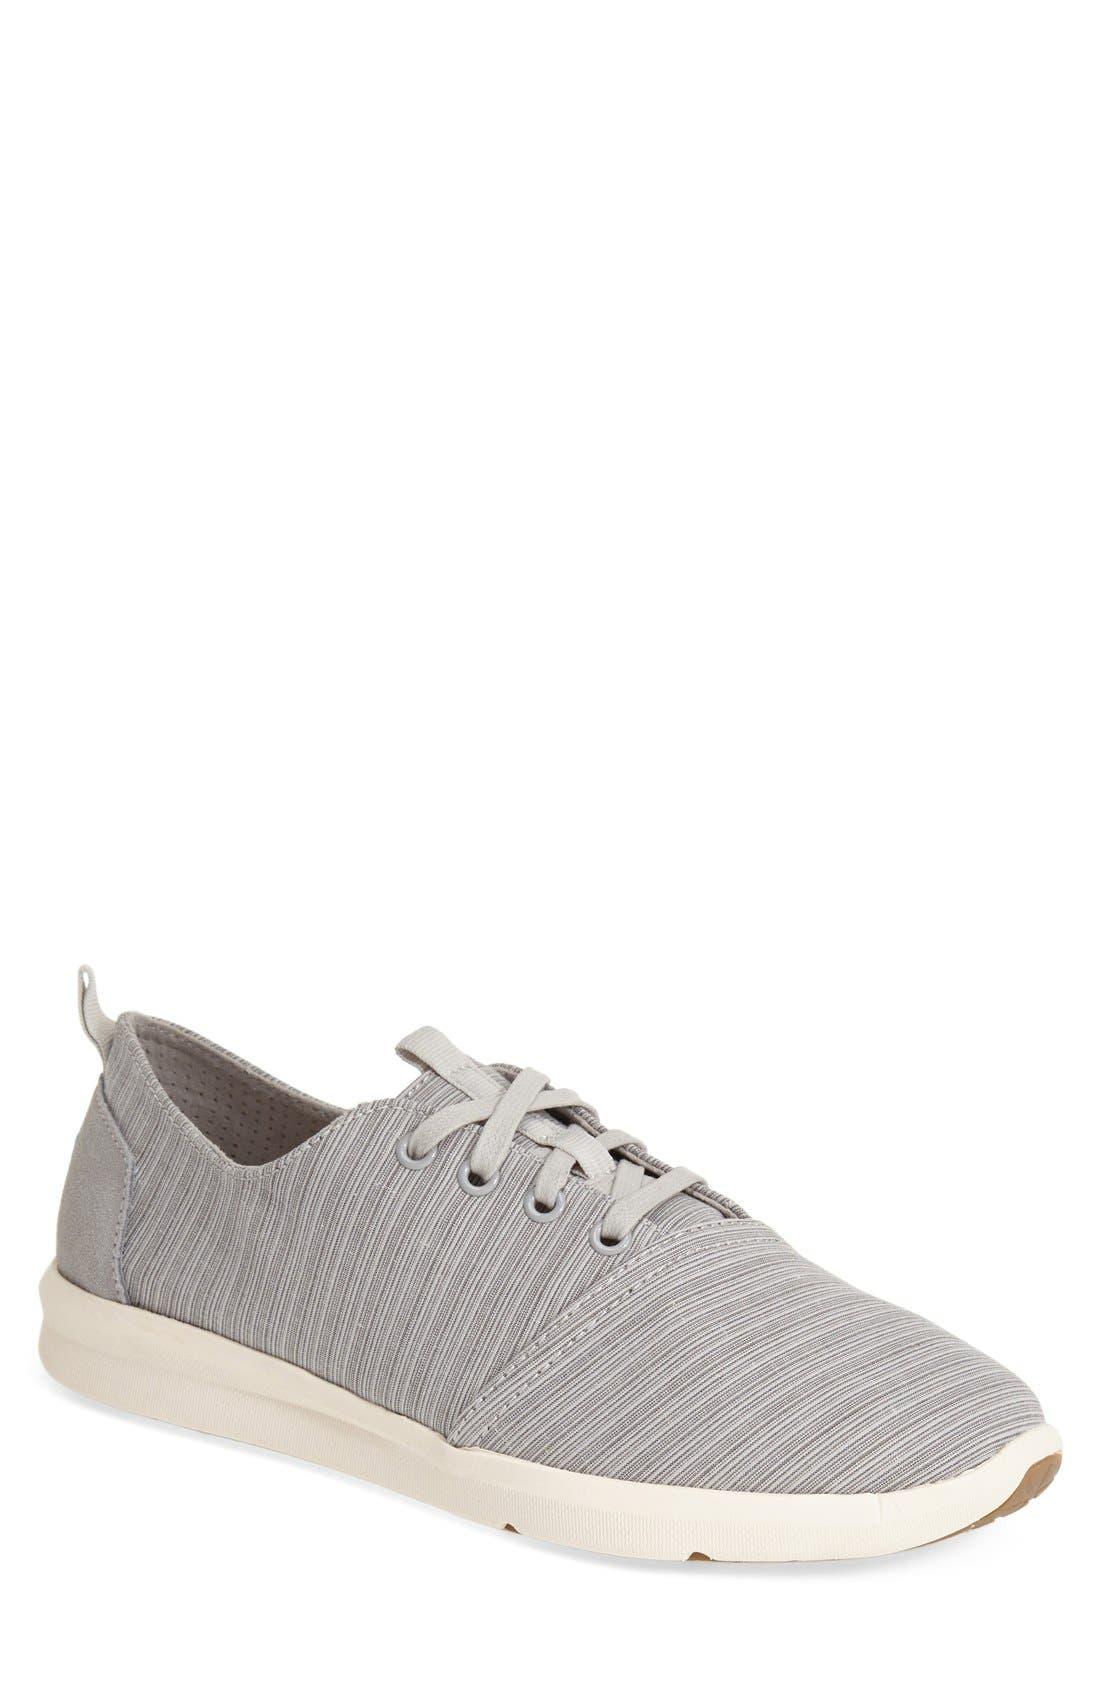 Alternate Image 1 Selected - TOMS 'Viaje' Sneaker (Men)